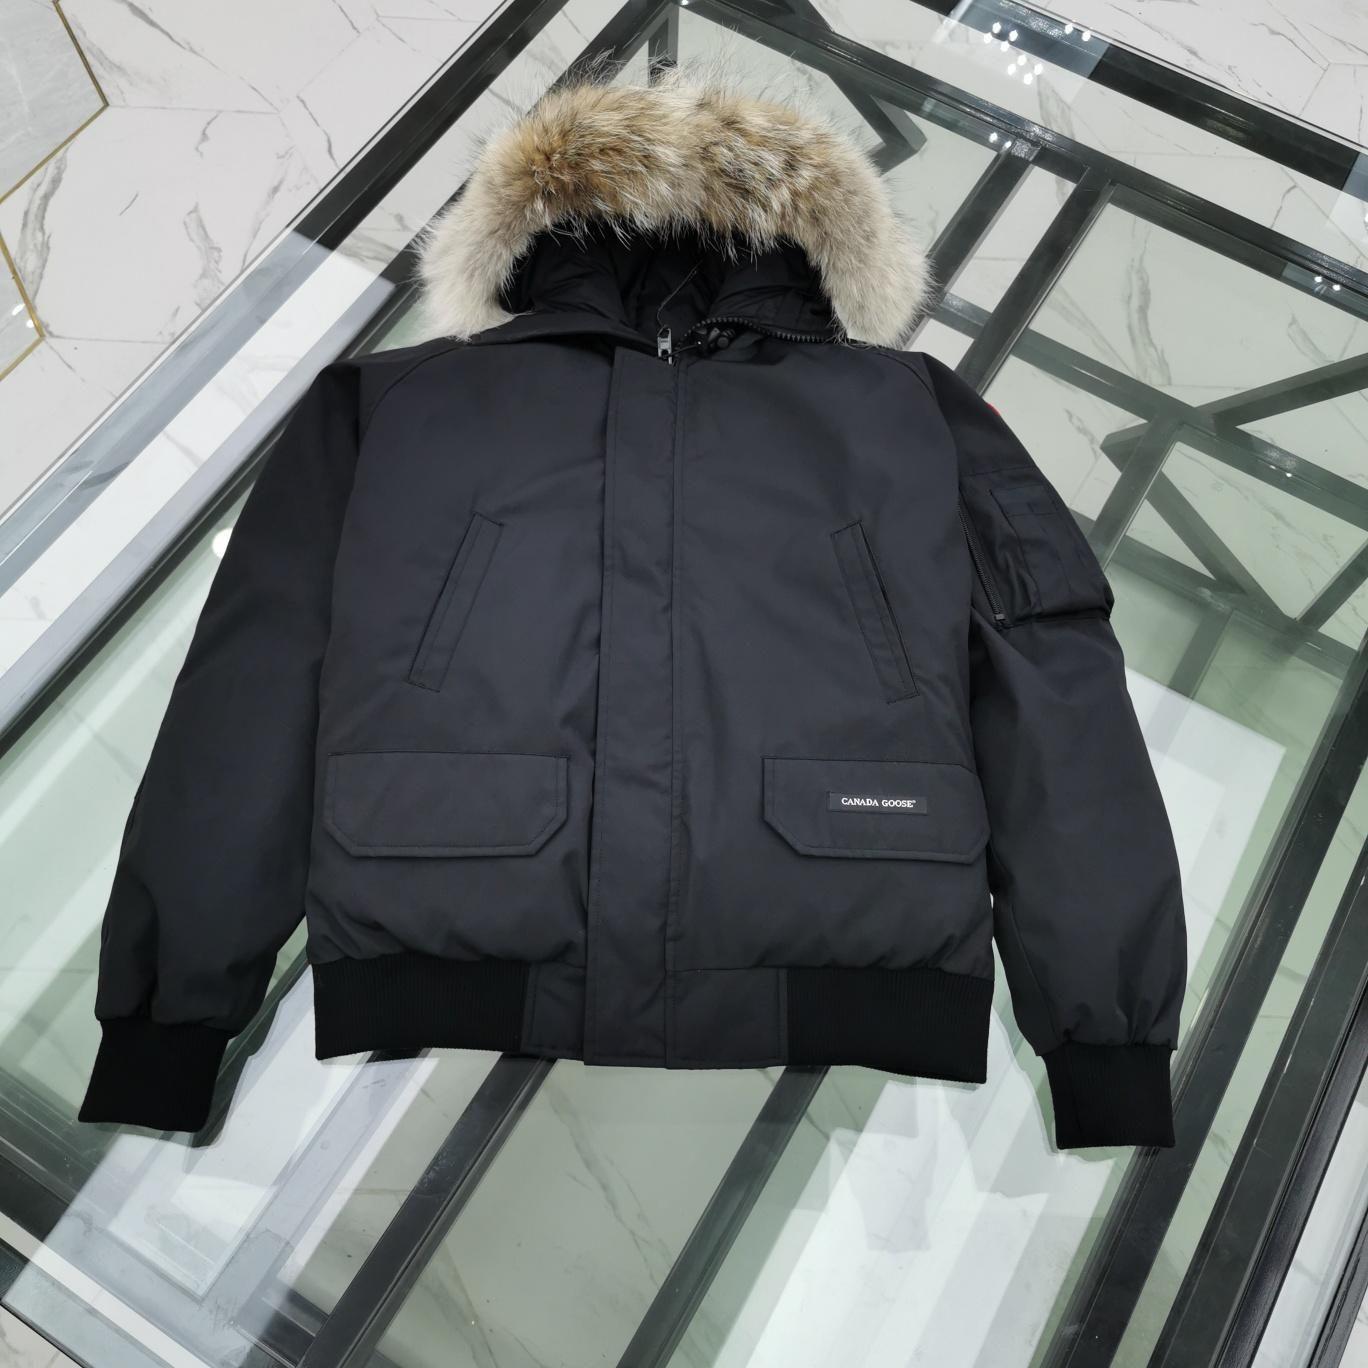 women Jackets brand Winter Patch Down Jacket Casual Warm Trendy Jacket Male White Duck Down women clothes Winter Coat tops 4898796